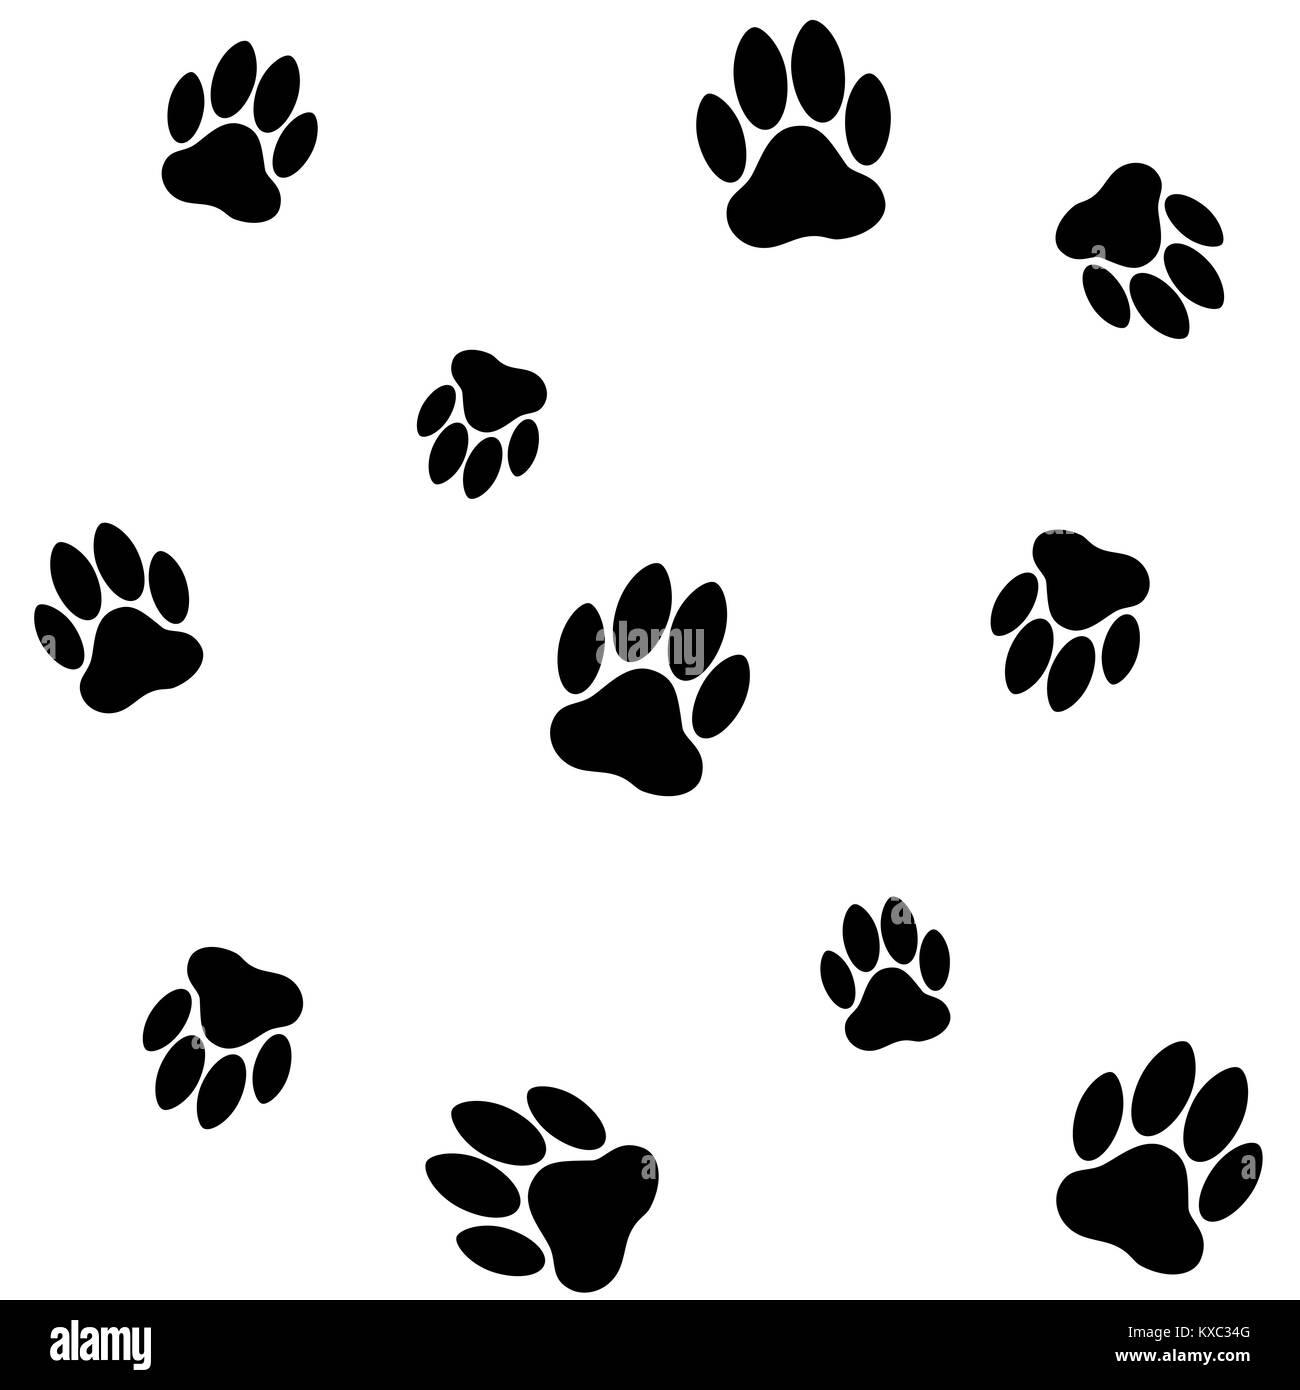 dog footprints pattern - Stock Image